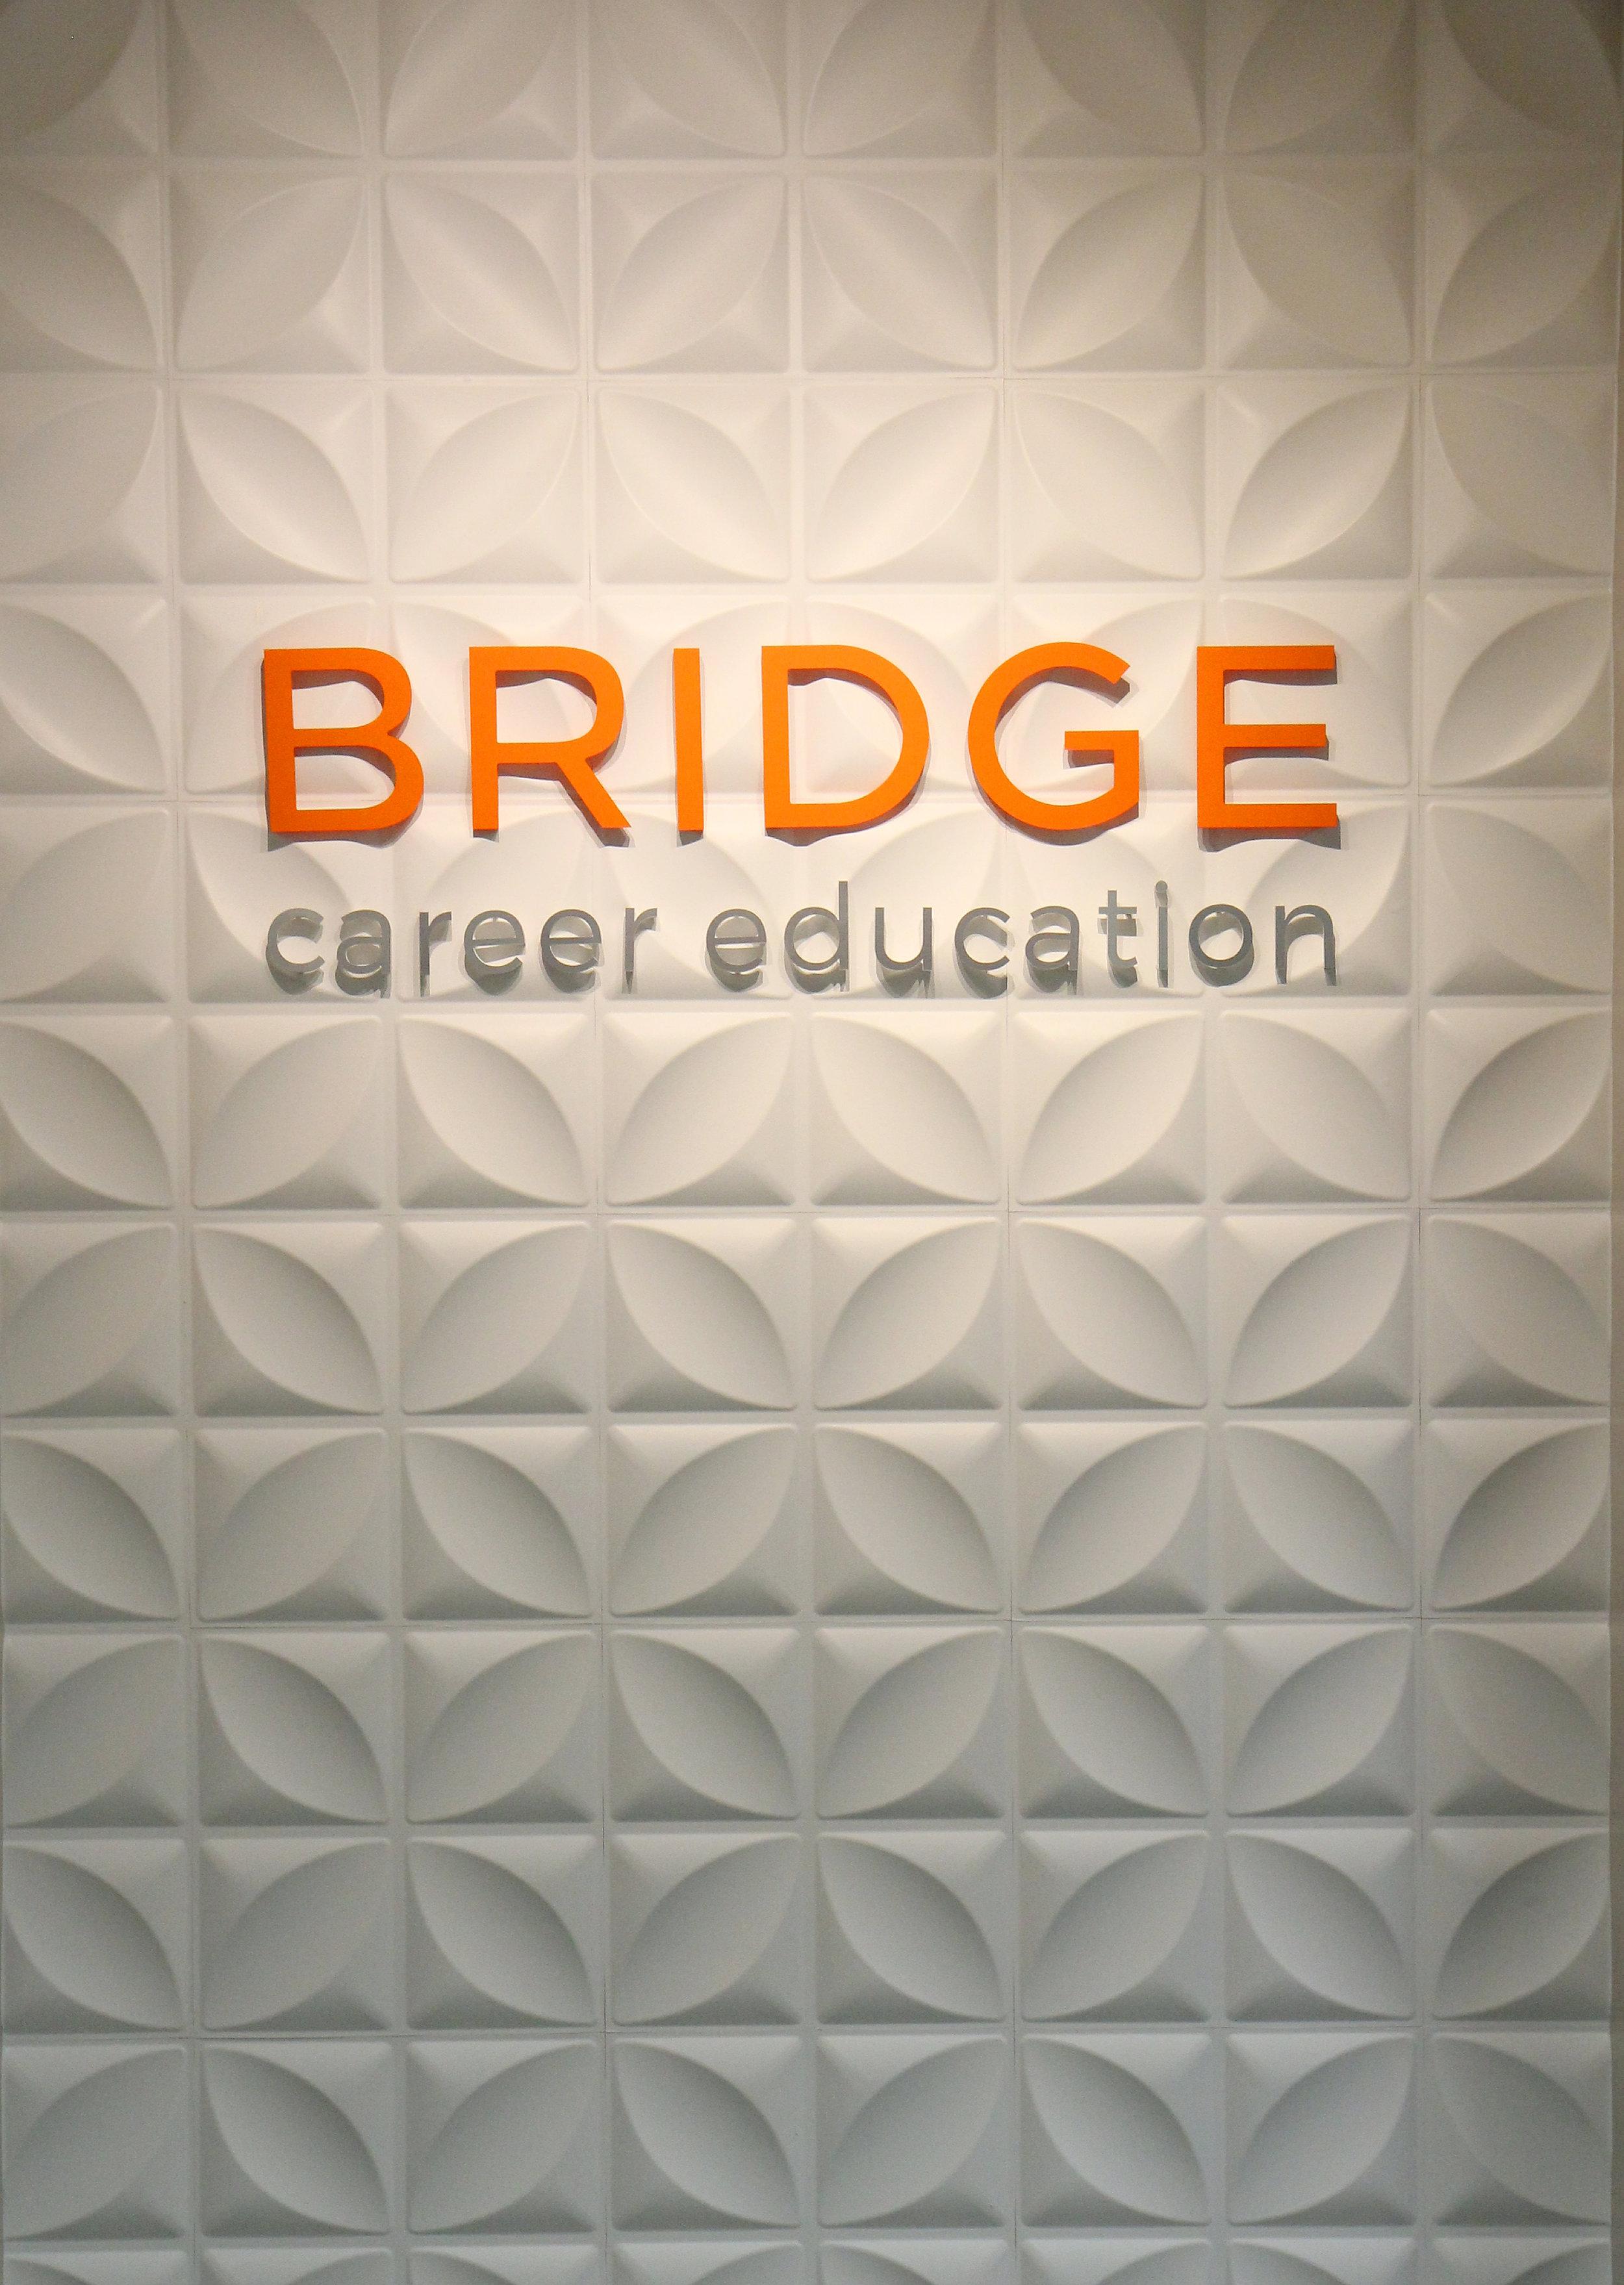 bridge-career-education-san-diego-college-medical-assistant-biller-programs.jpg